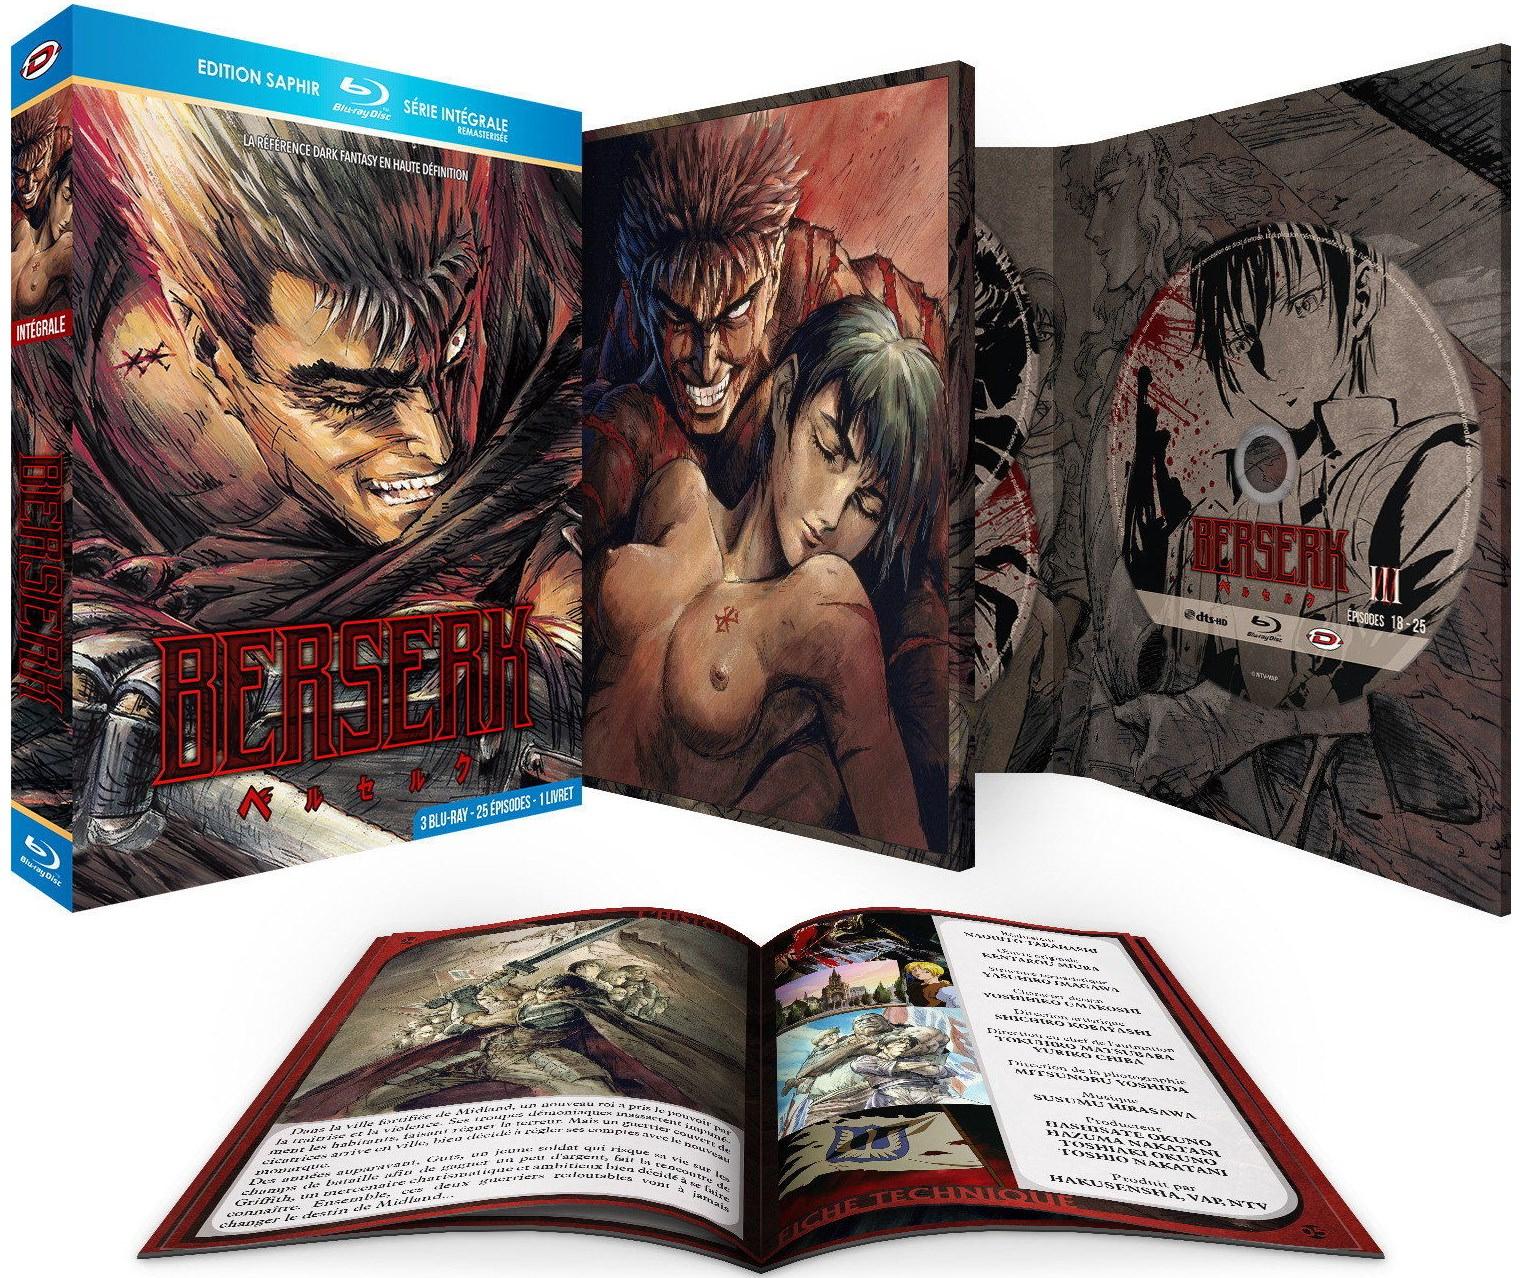 Coffret Blu-ray Berserk l'Intégrale Edition Saphir avec Livret